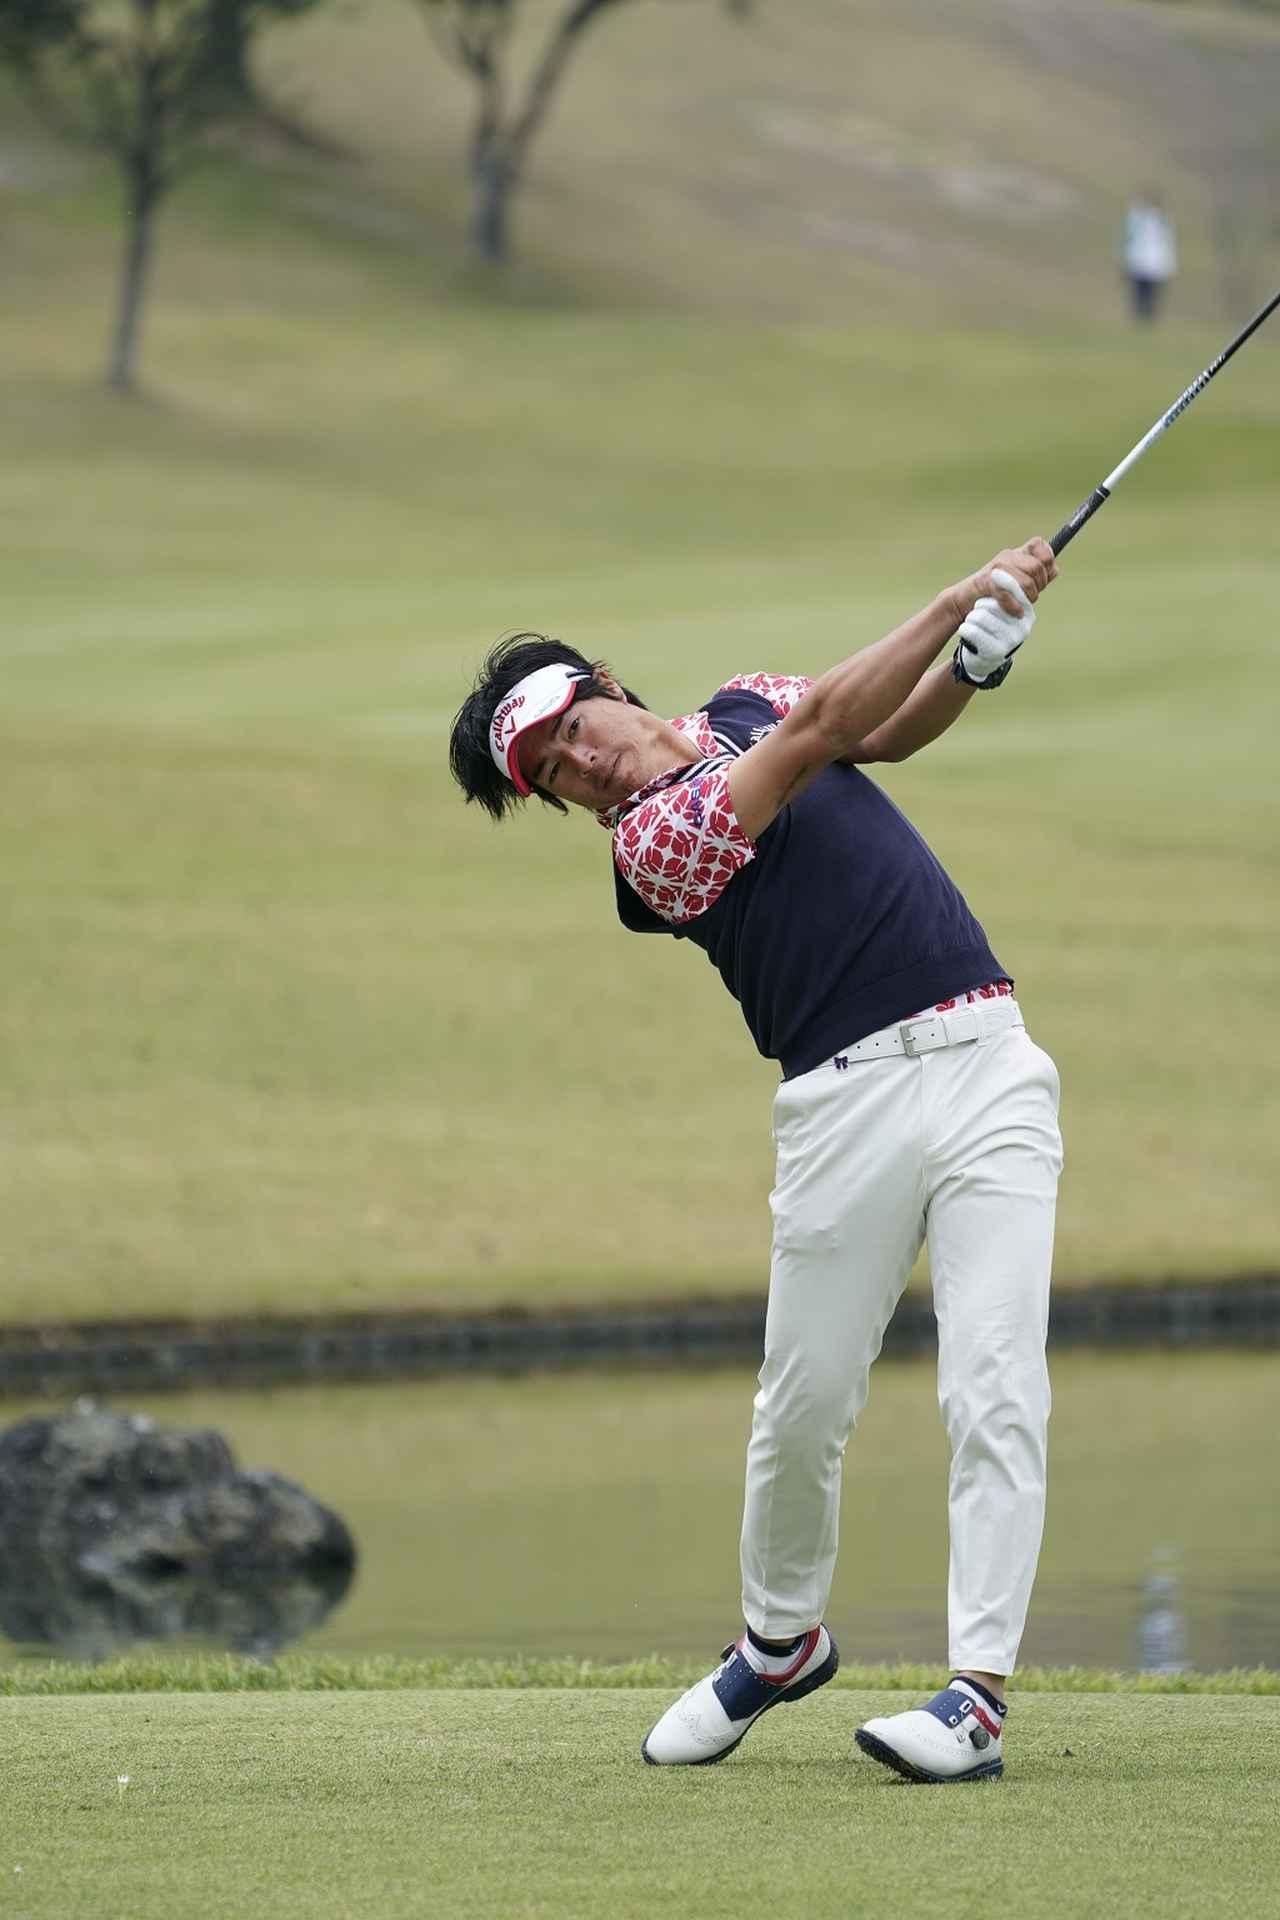 Images : 13番目の画像 - 石川遼ドライバー前方連続写真 - みんなのゴルフダイジェスト